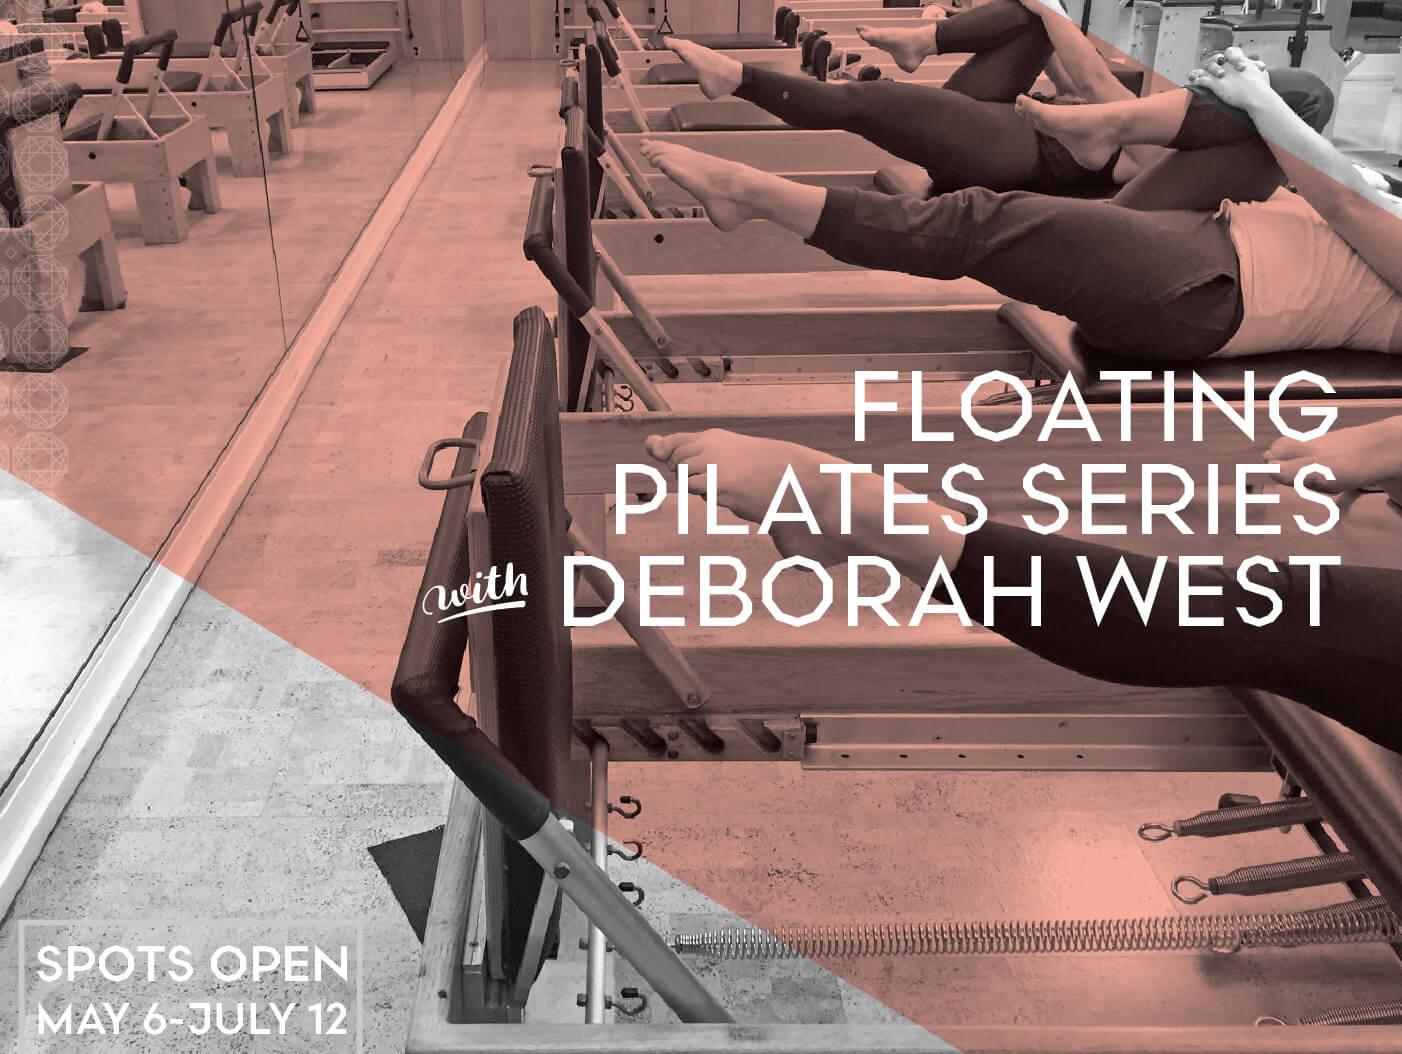 Floating Pilates Series